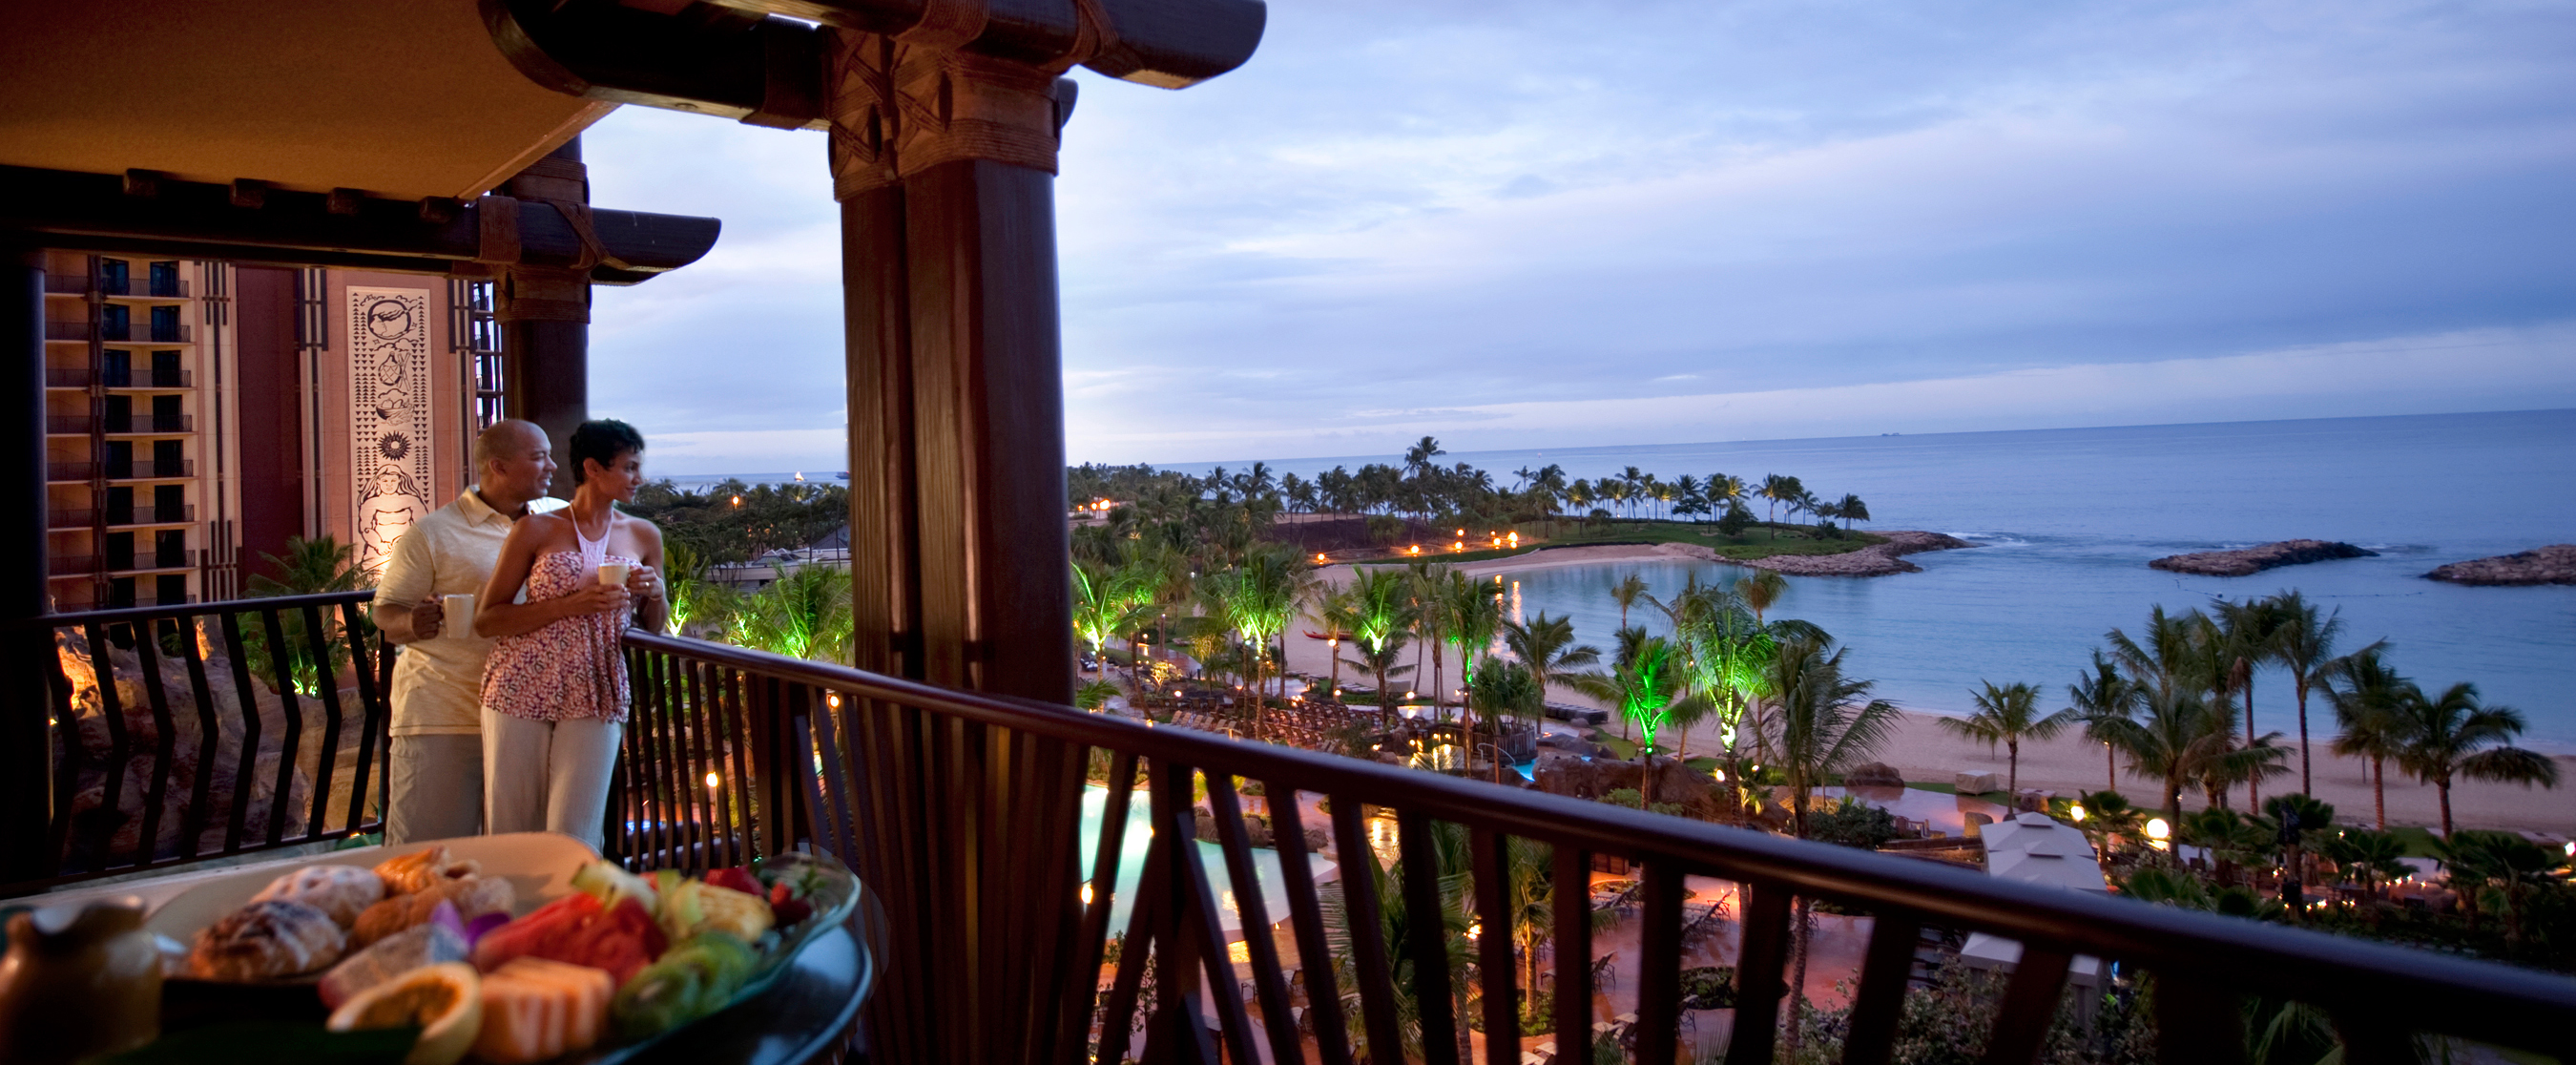 orlando 3 bedroom villas kisekae rakuen com 3 bedroom condo panama city beach rental trend home